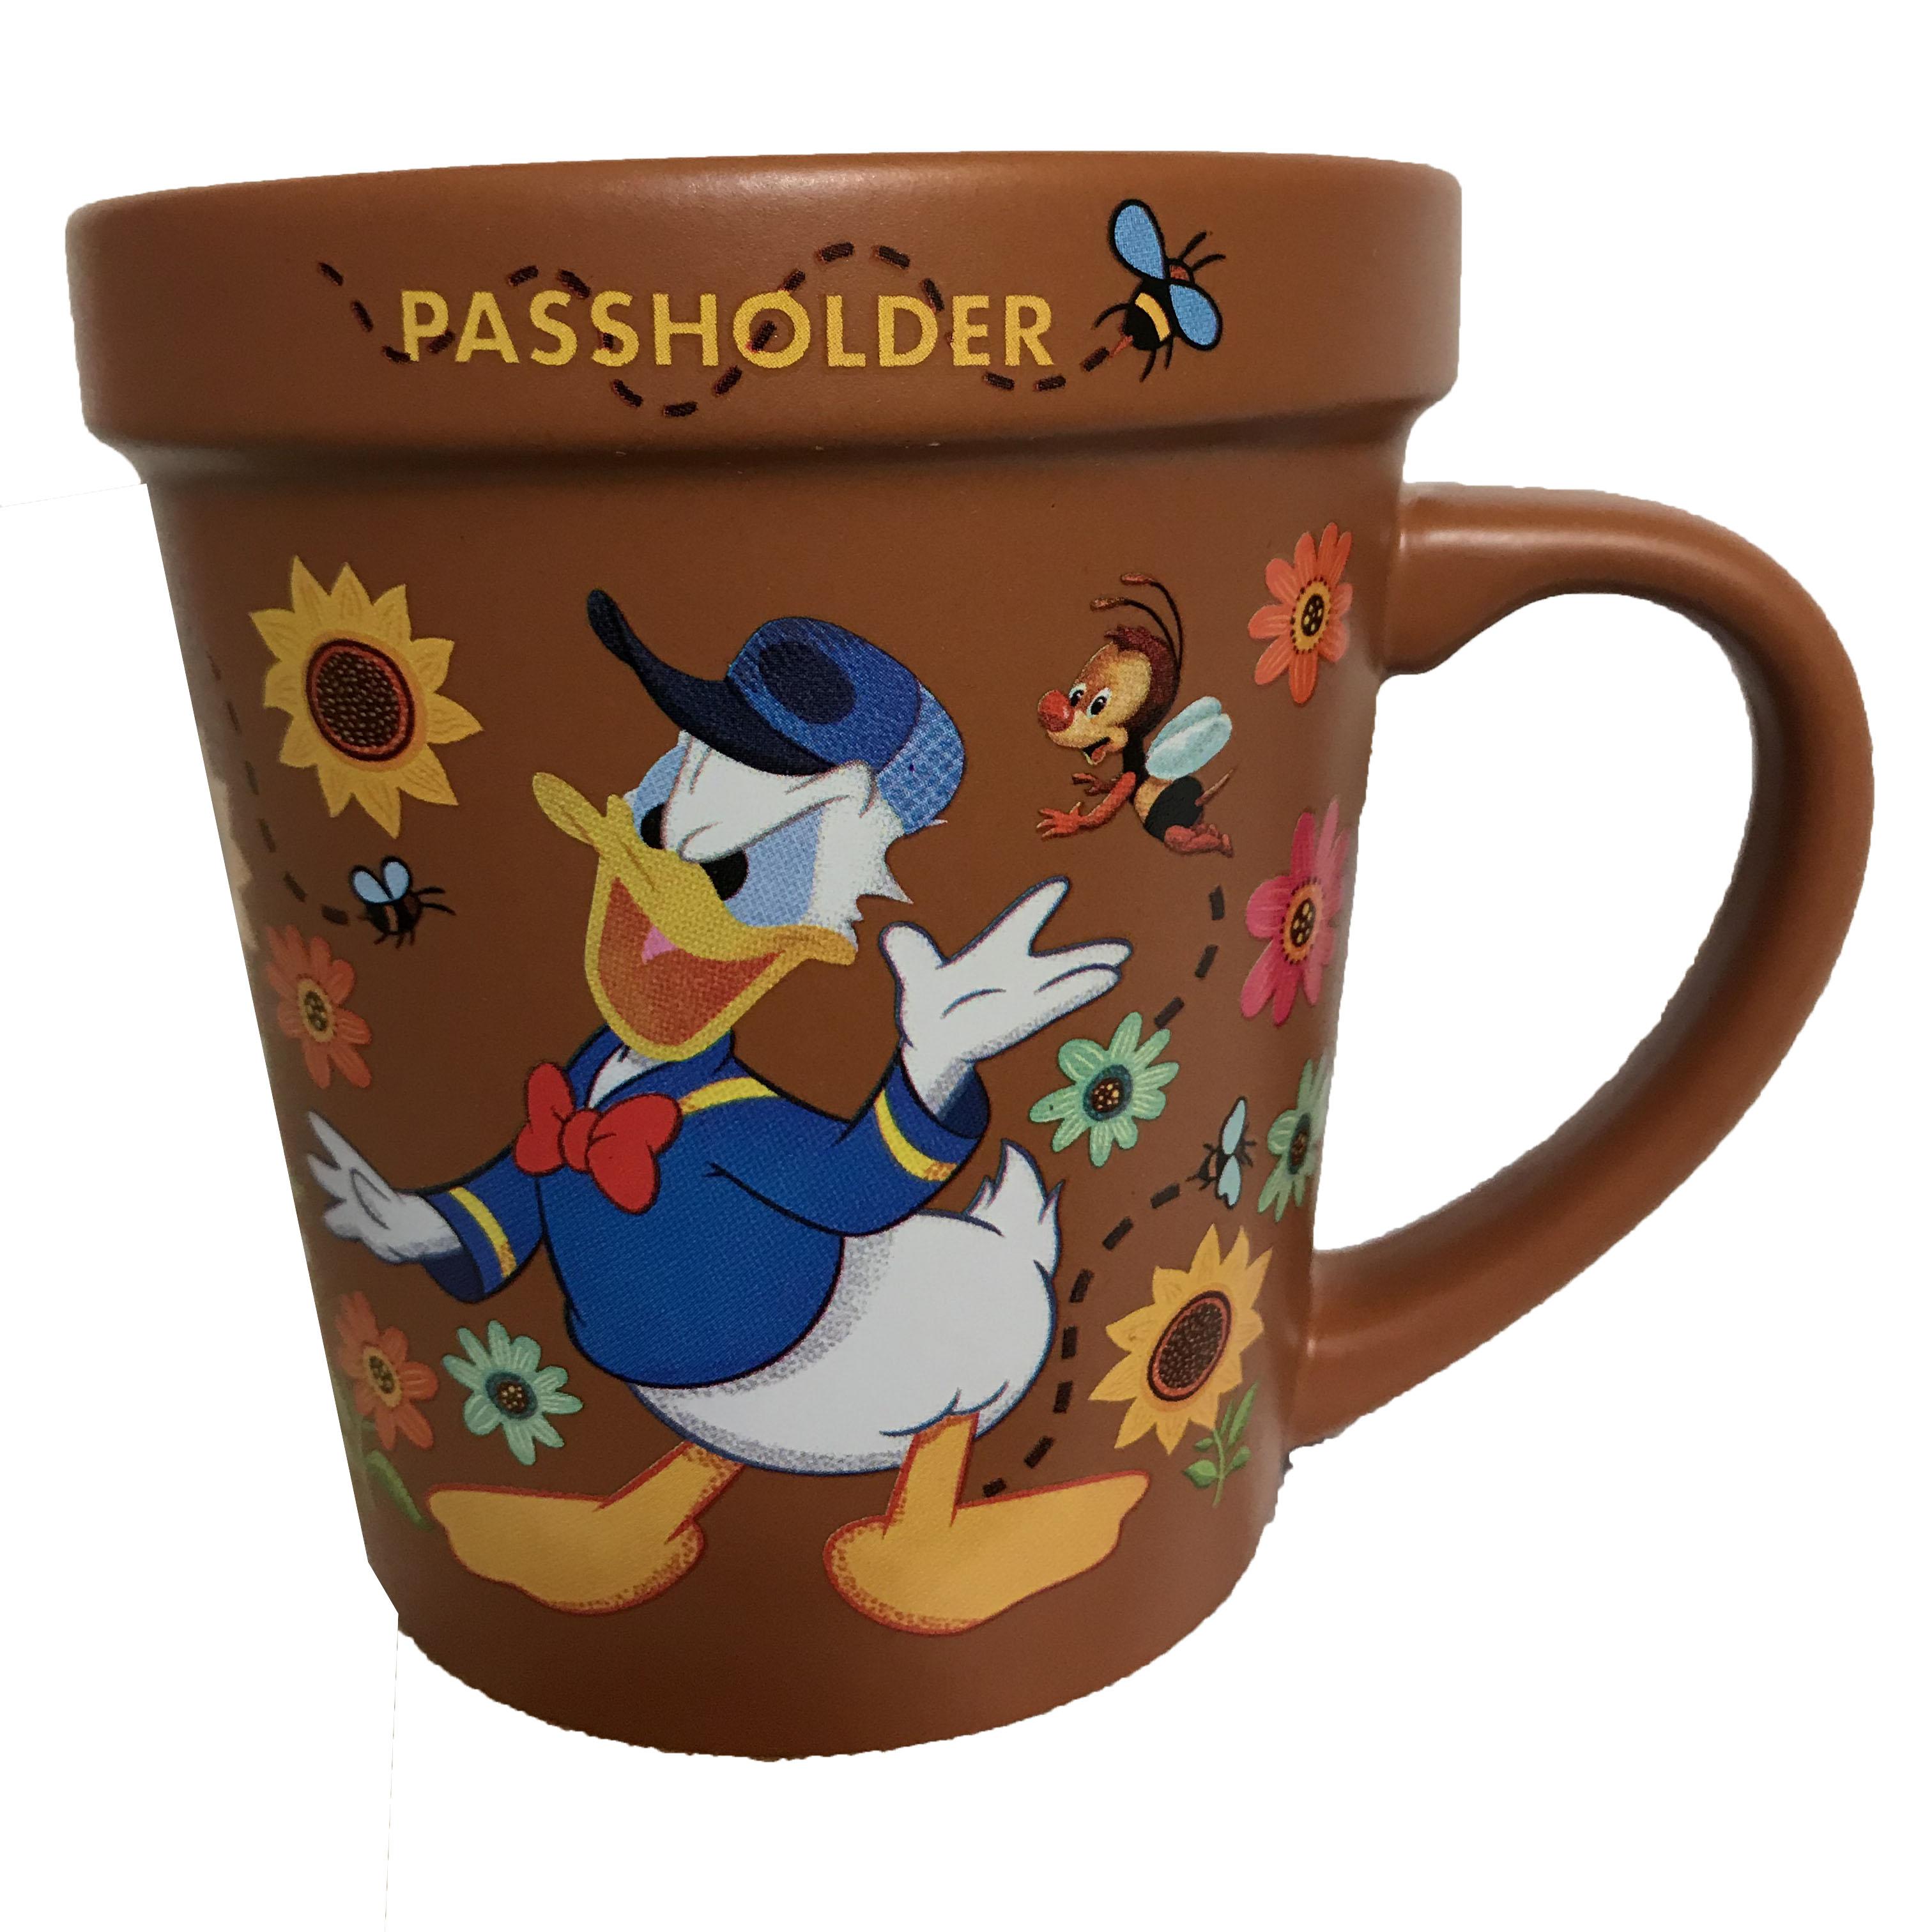 Mug Garden Passholder Coffee And Flower Duck Donald 2019 Disney kOPn08w